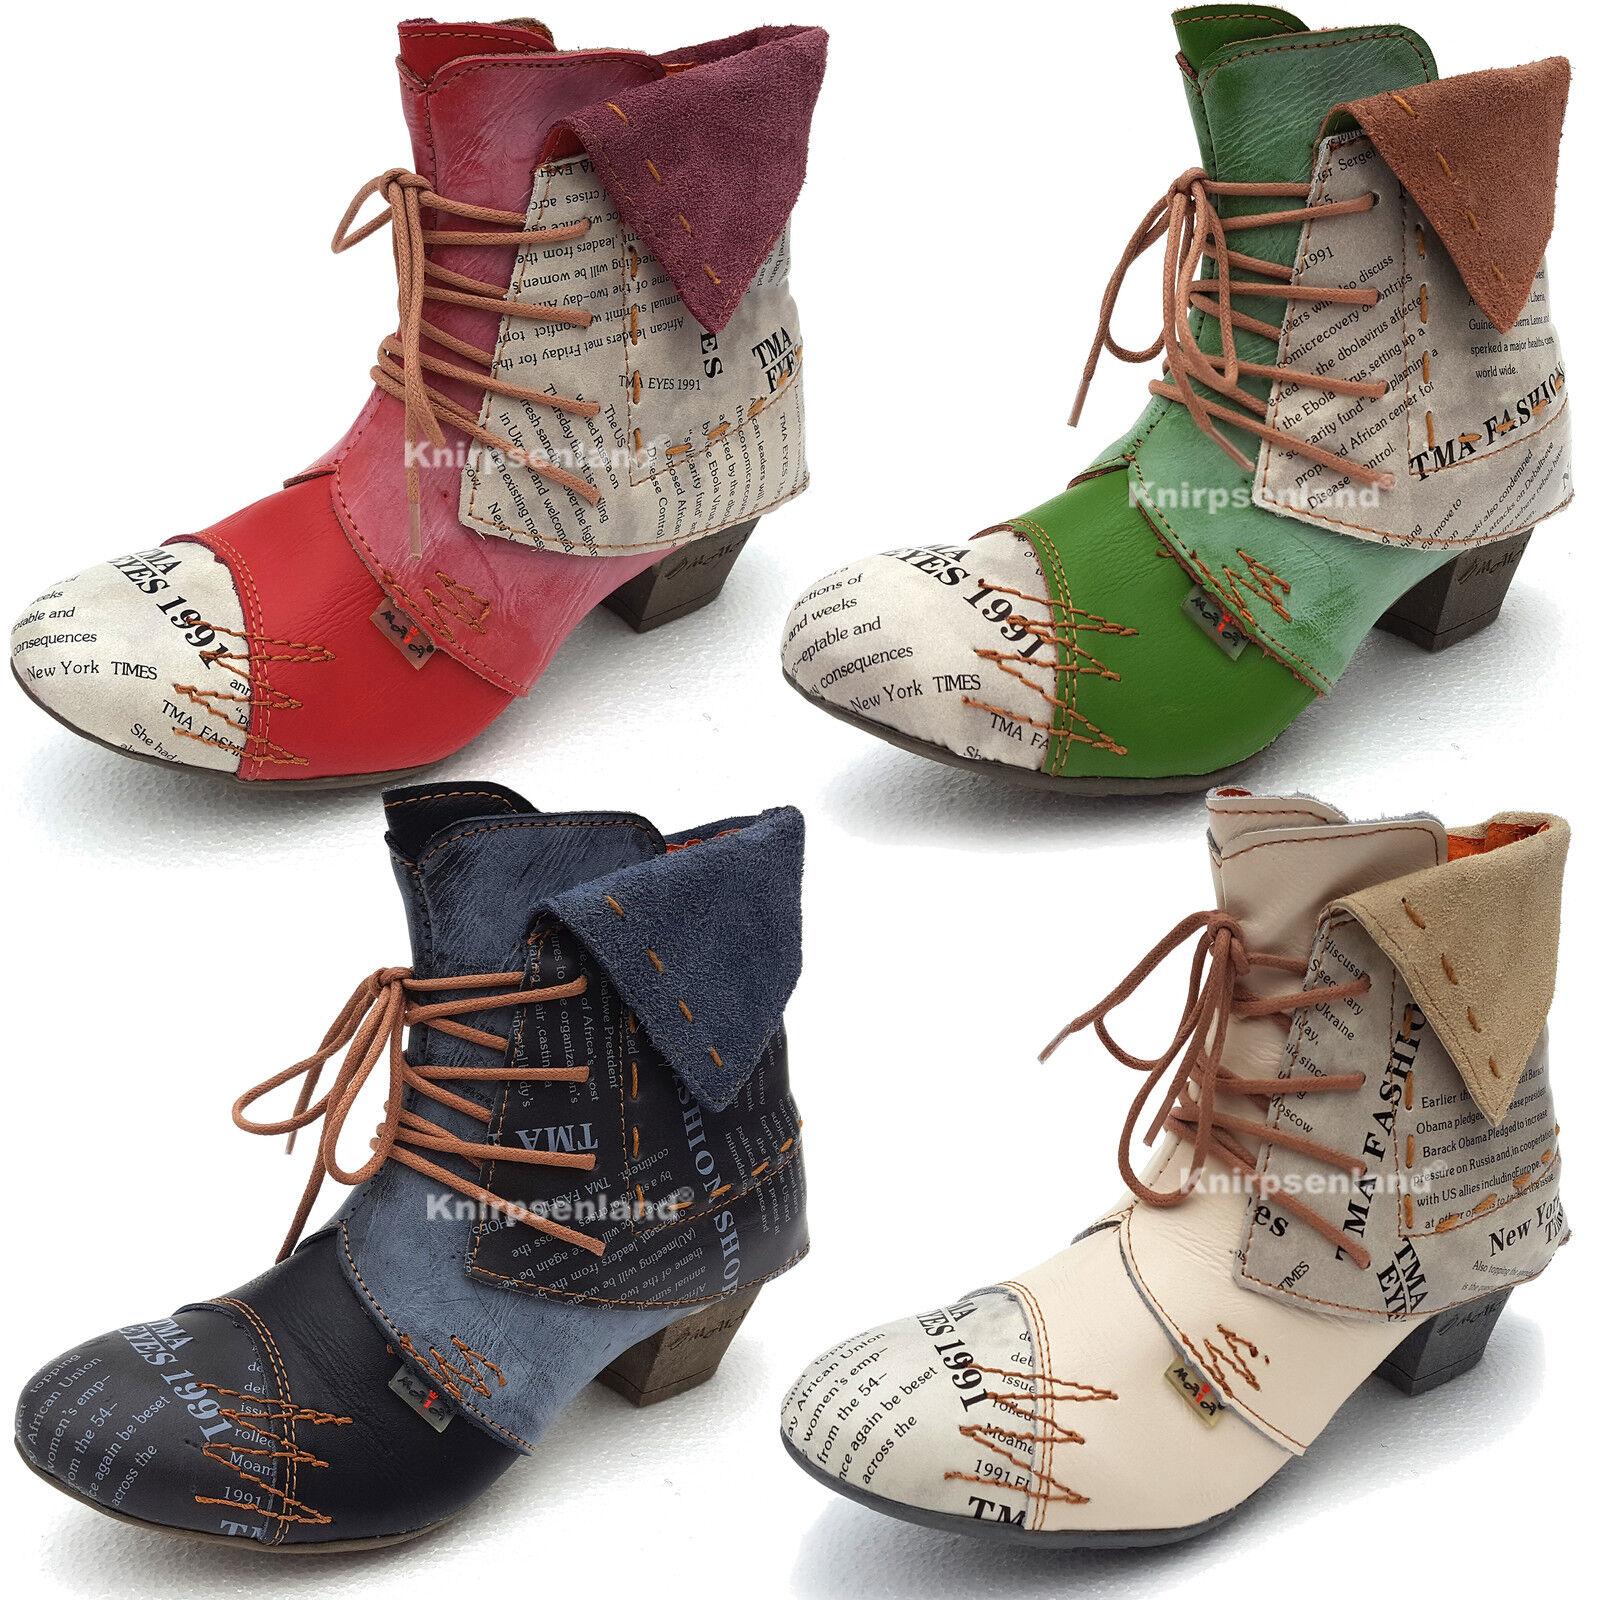 TMB Damen Stiefelette Schuhe echt Leder Stiefel Stiefeletten Damenstiefel 6106N